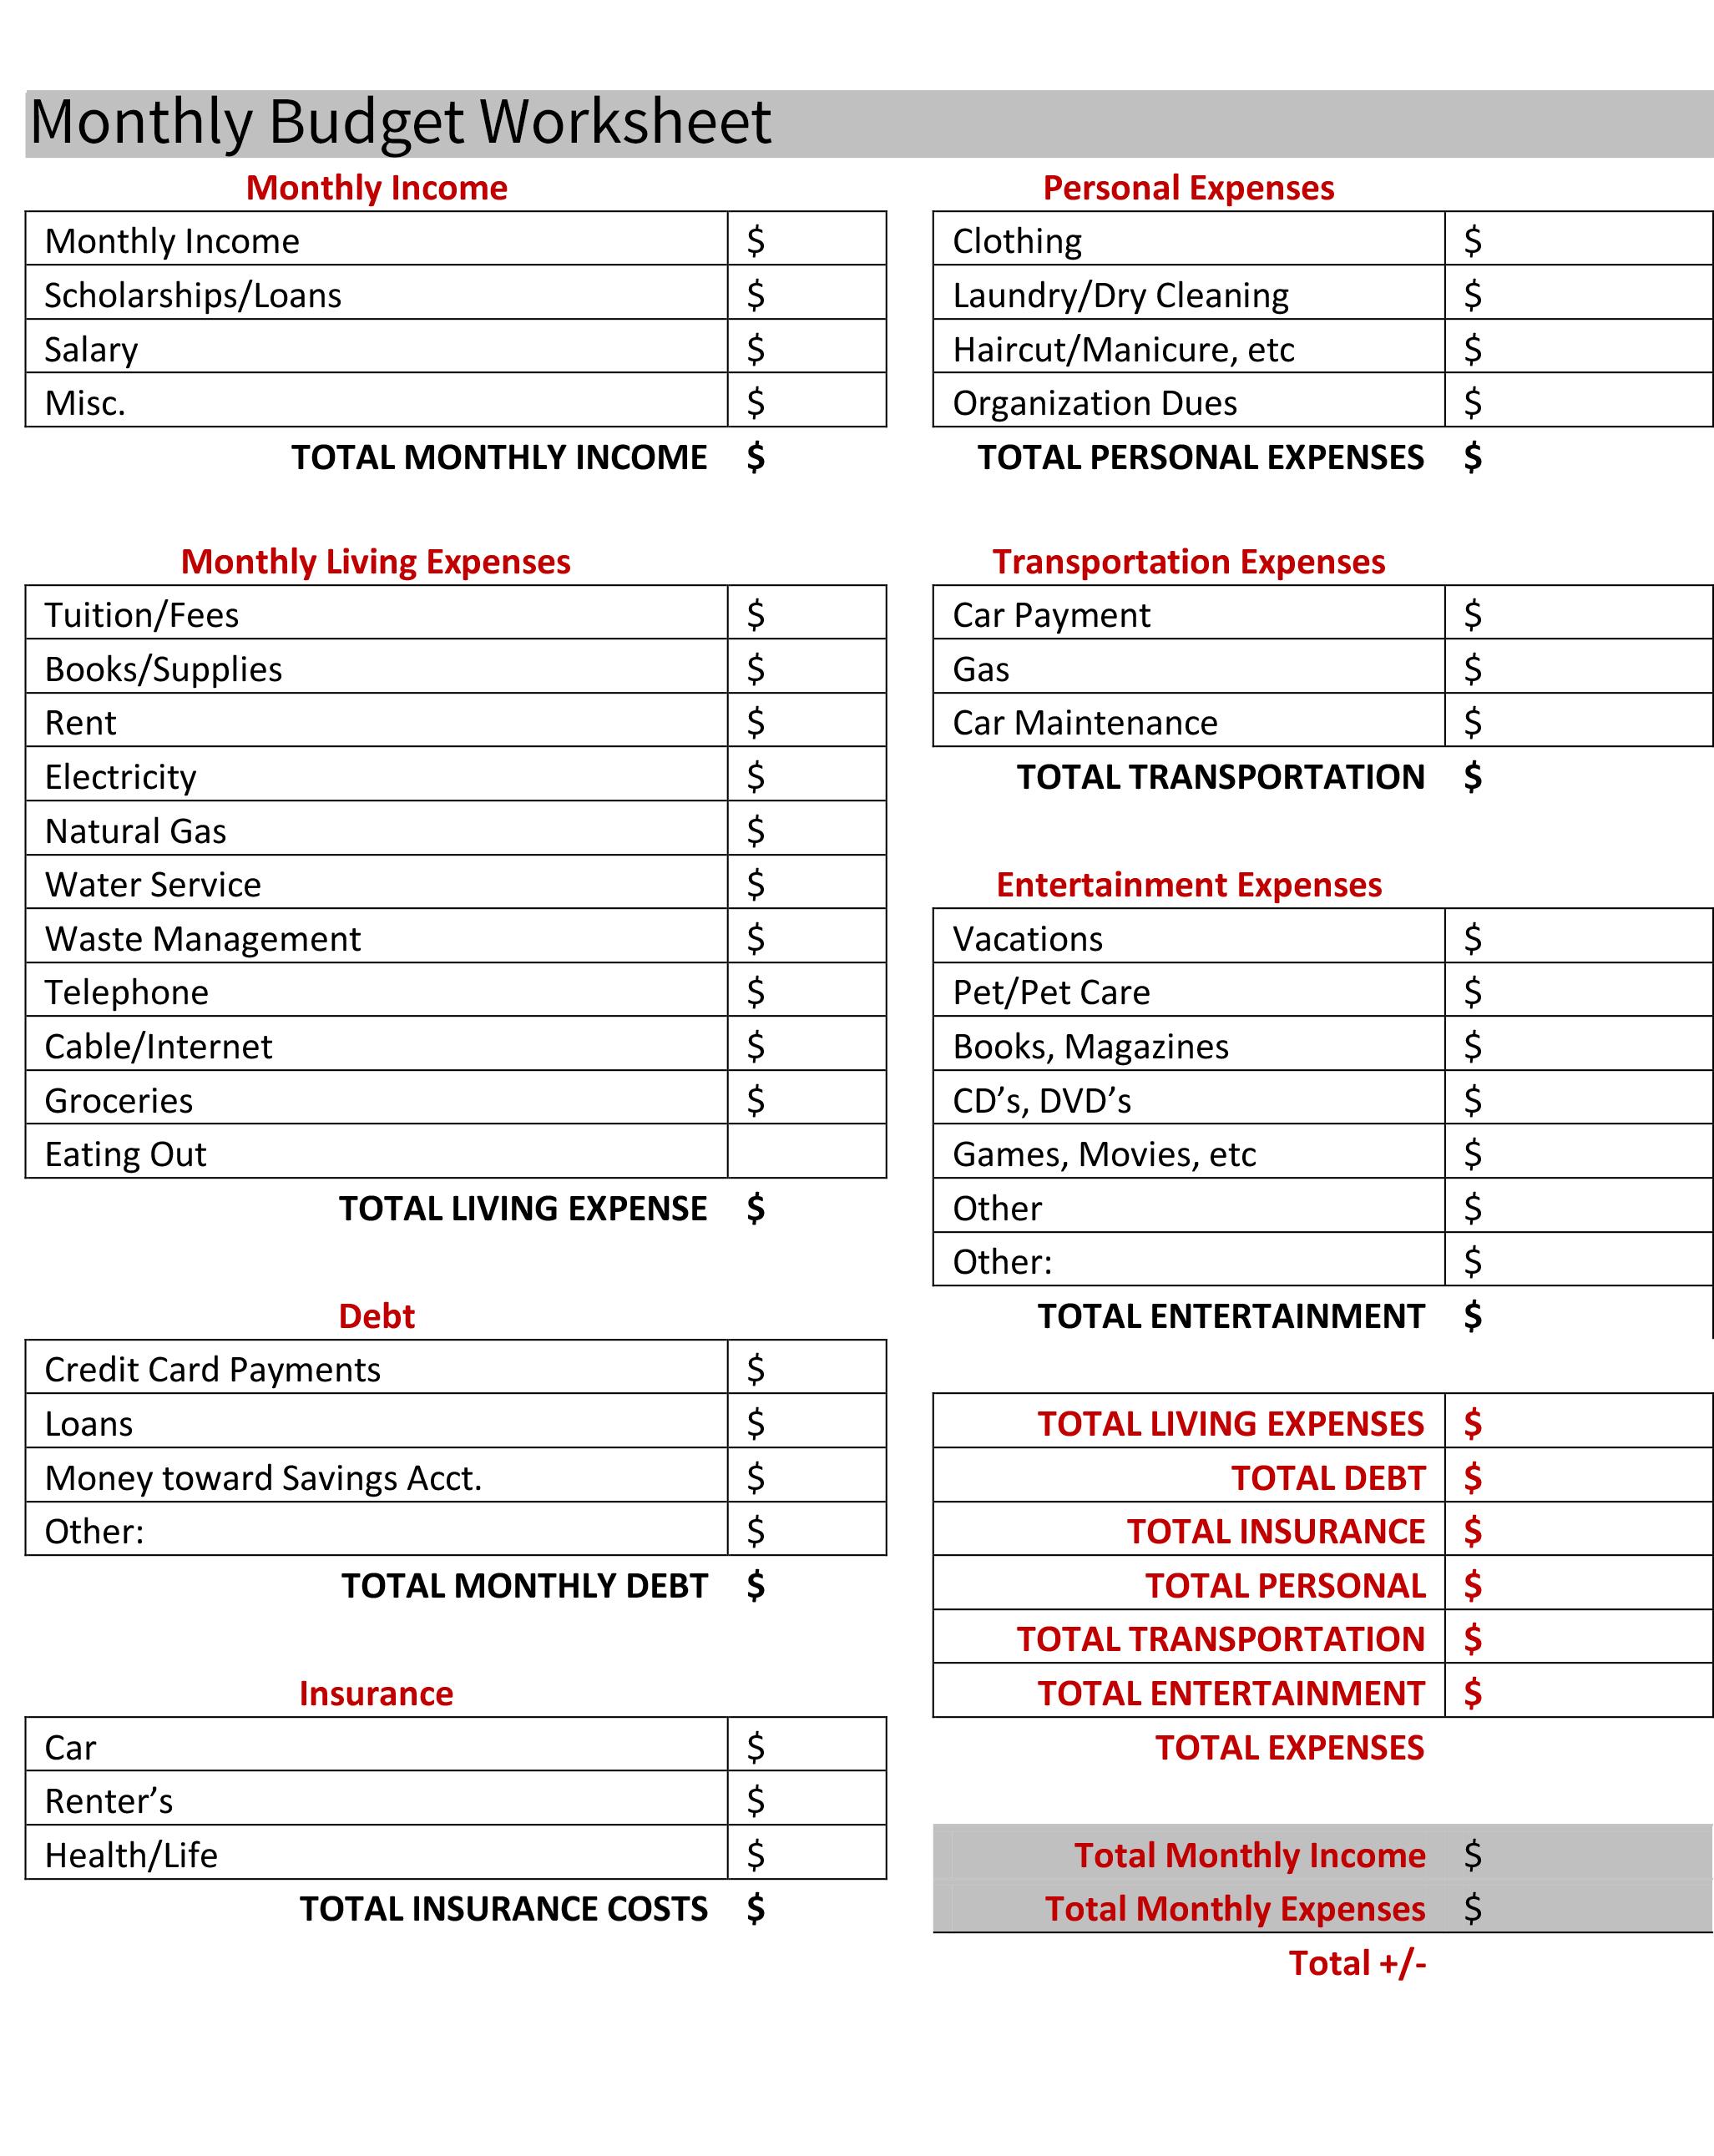 Best Way To Set Up Budget Spreadsheet Regarding How To Set Up A Monthly Budget Worksheet  Homebiz4U2Profit